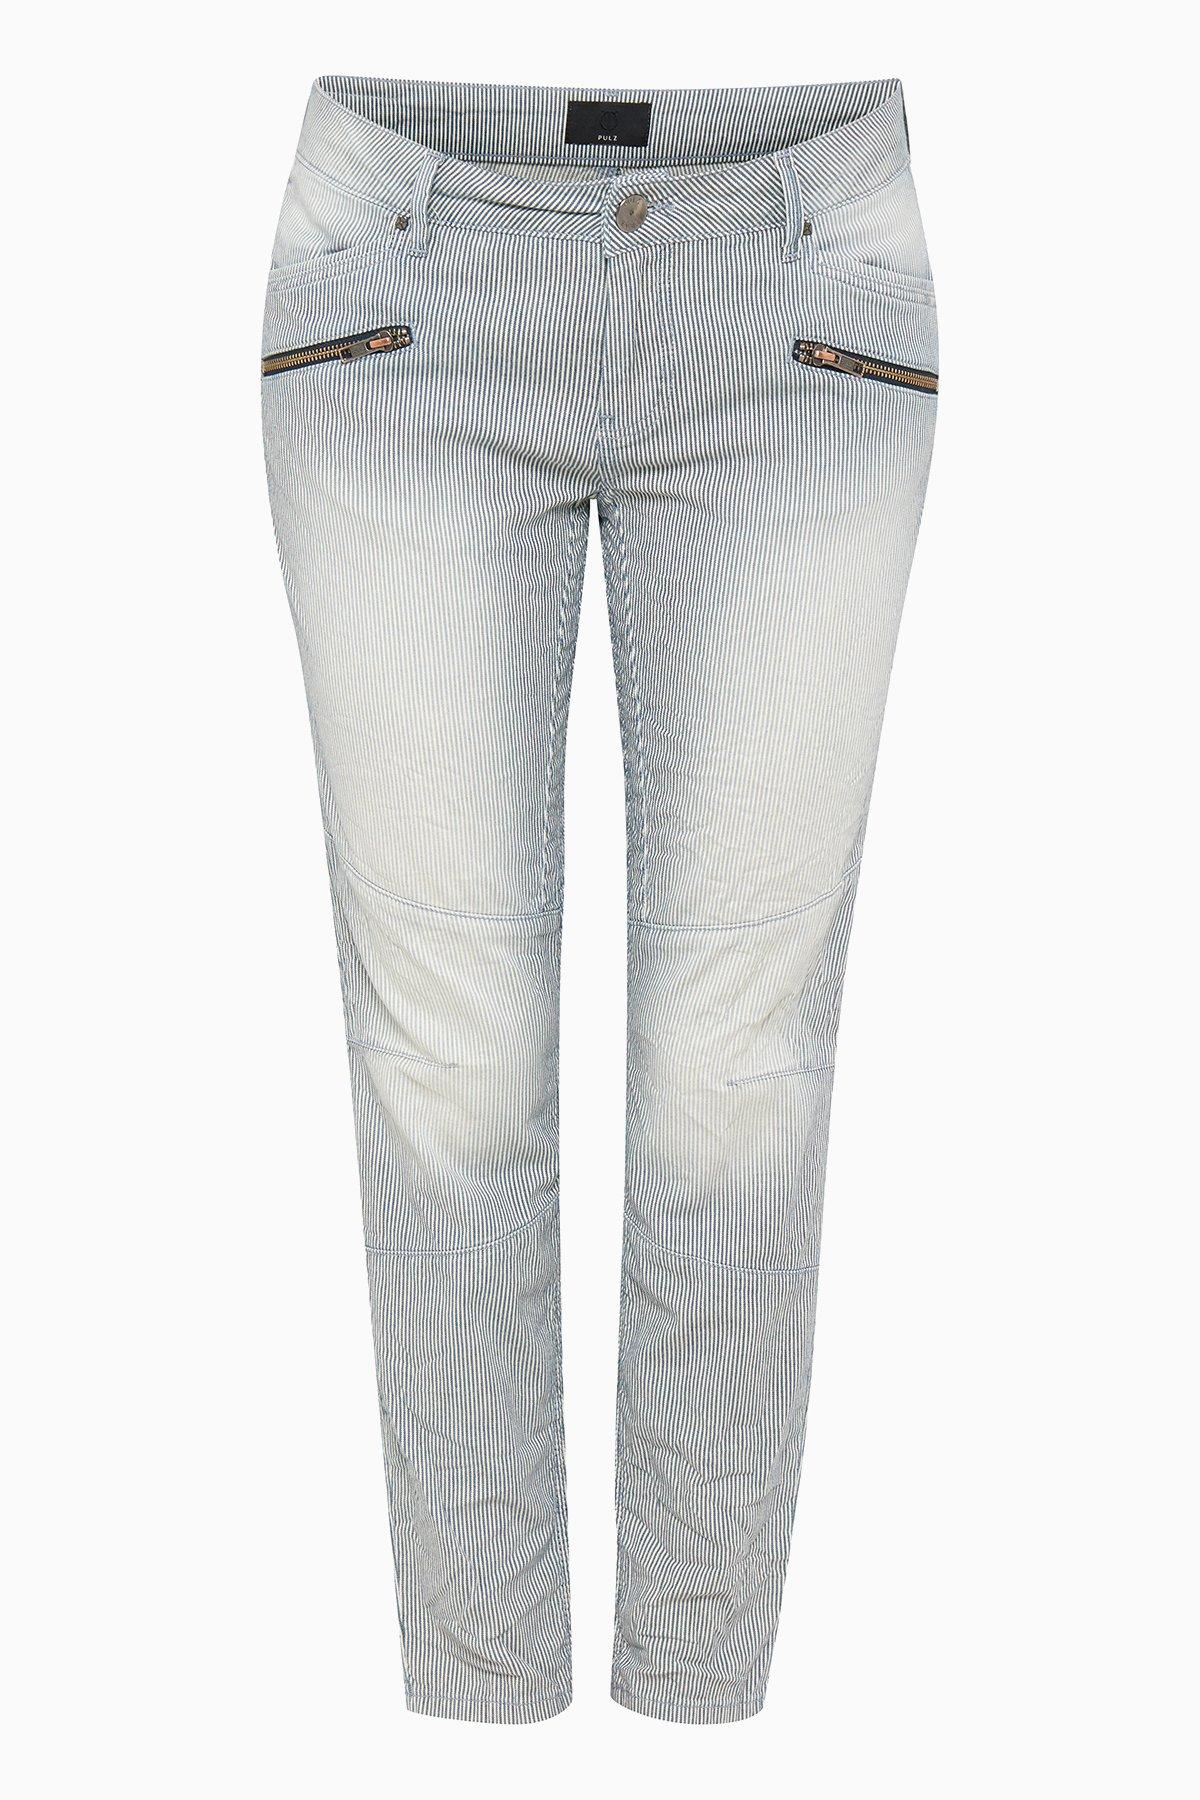 Soft Cream Pants Casual – Køb Soft Cream Pants Casual fra str. 32-46 her